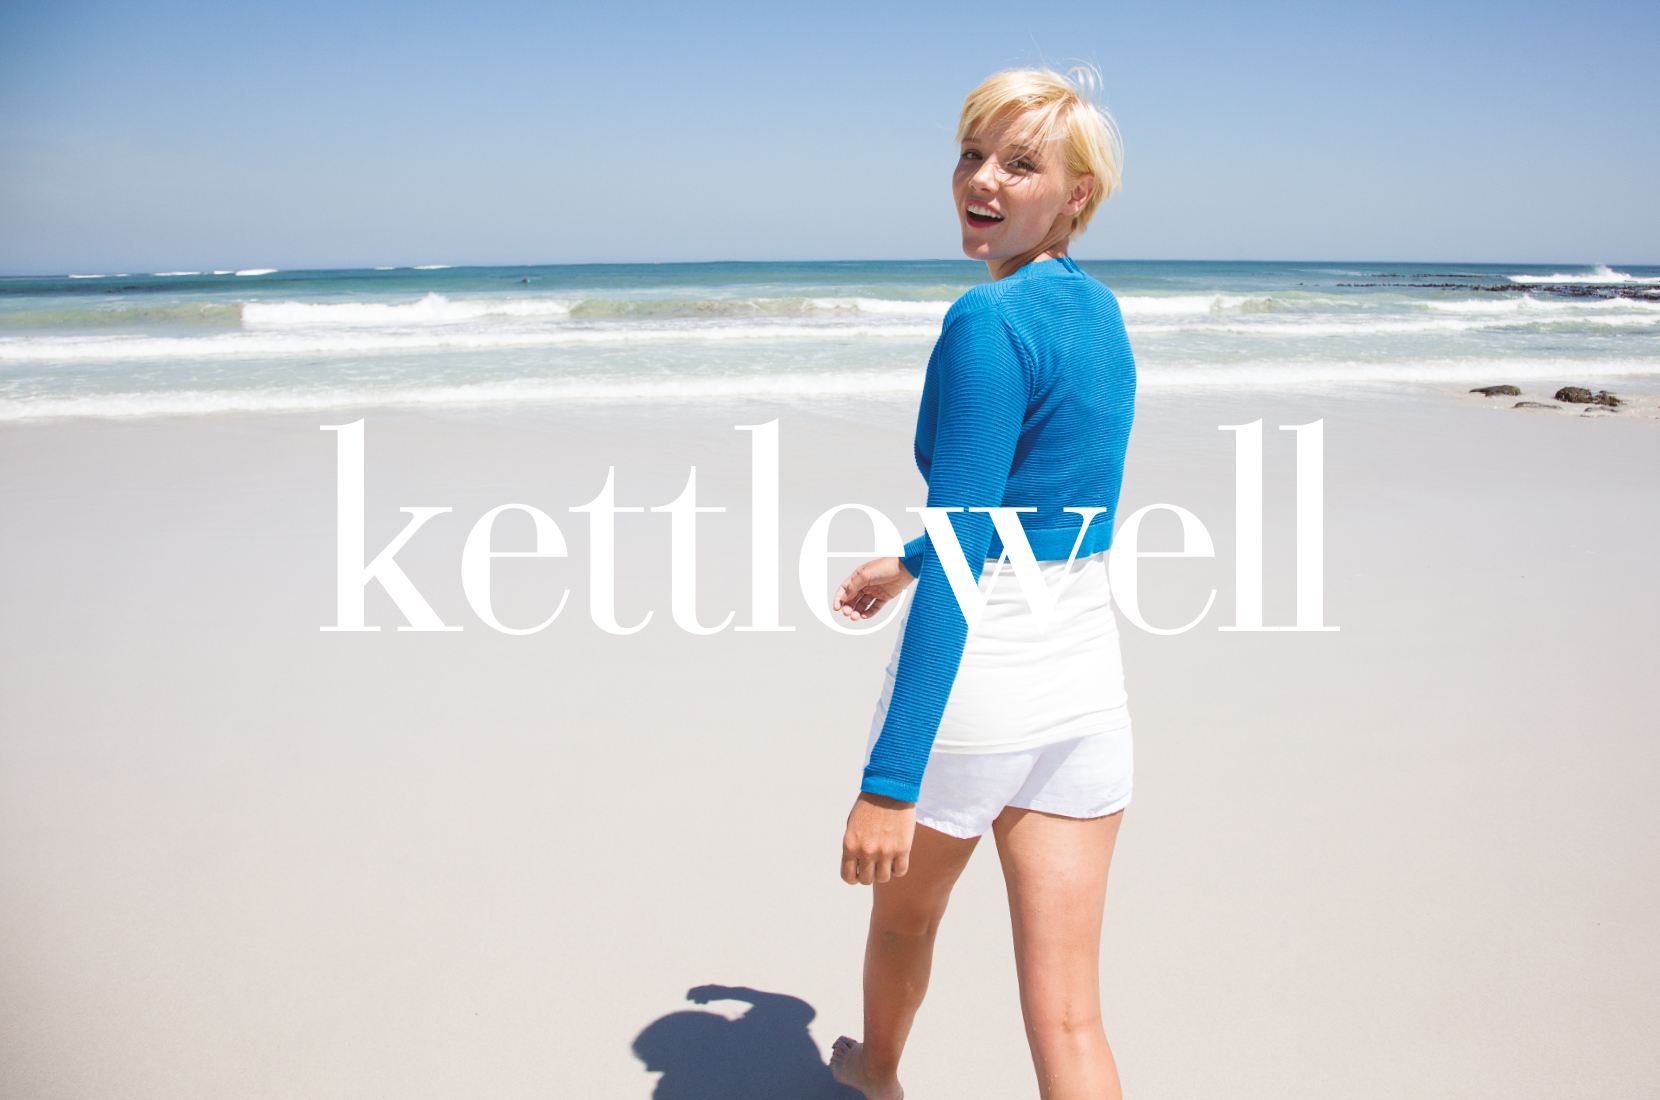 kettlewellS181